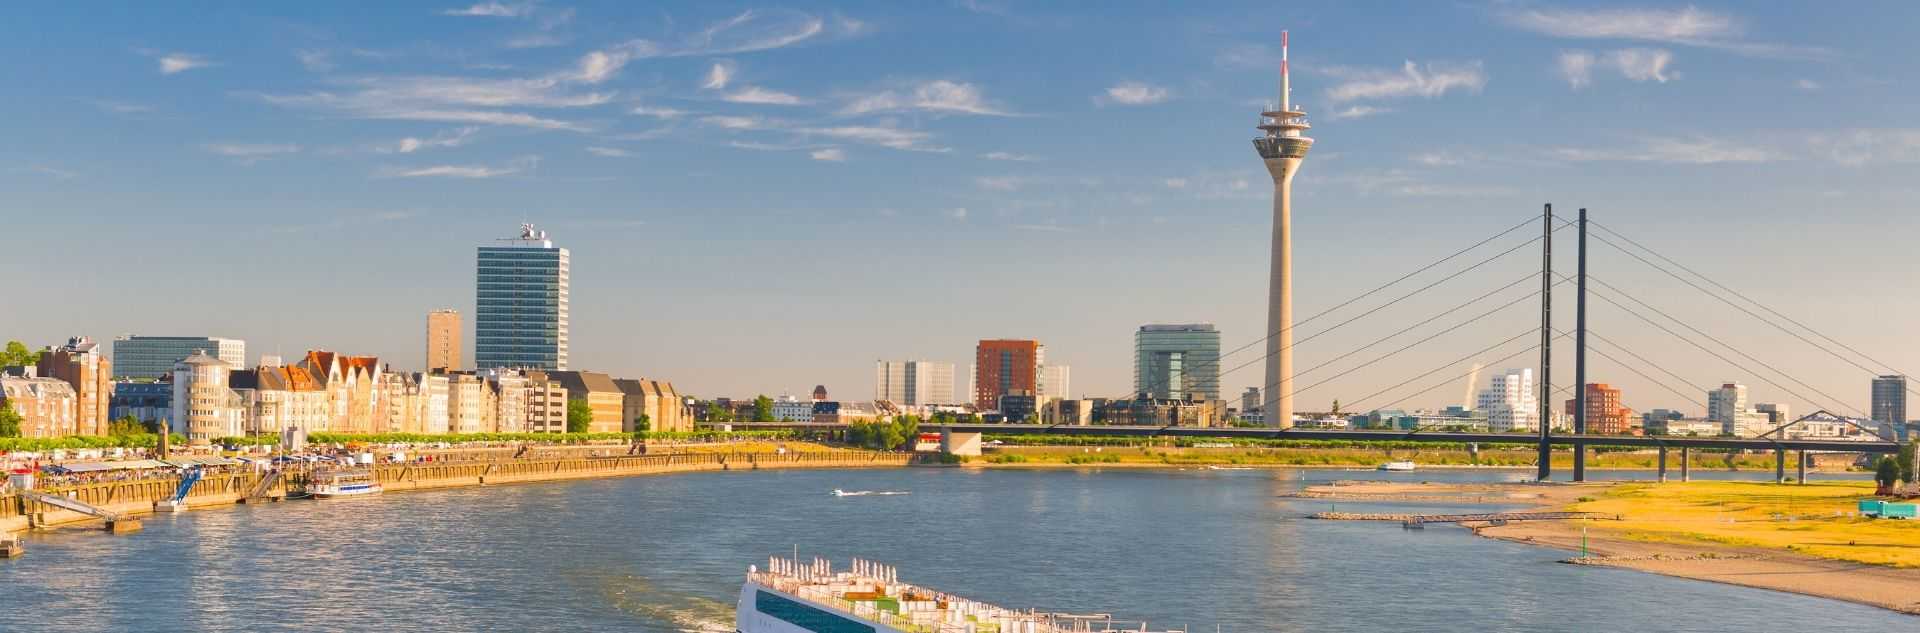 Stadtansicht Düsseldorf - Reisebüro Düsseldorf